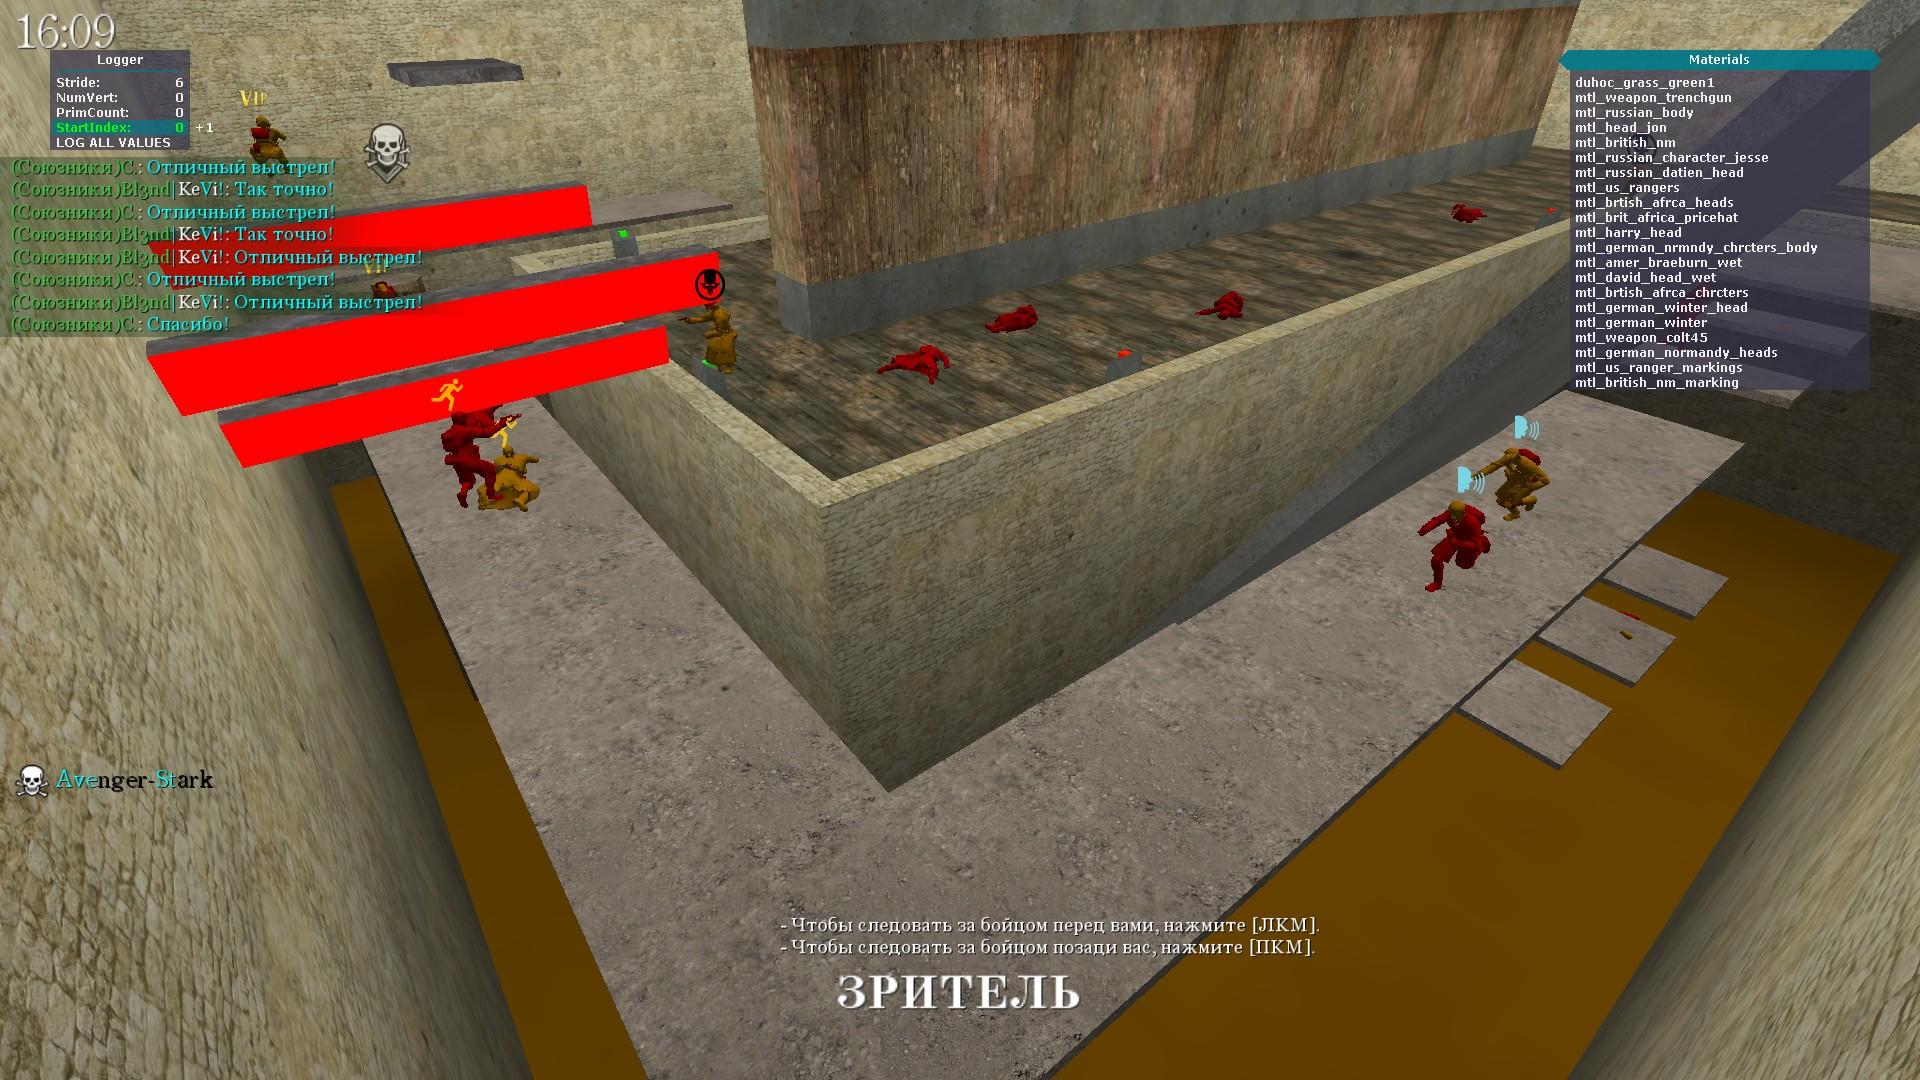 [Source] Logger for Call of Duty 2 D3D9 12b4f2dc-9d66-11e6-819f-dc96c08f82fe